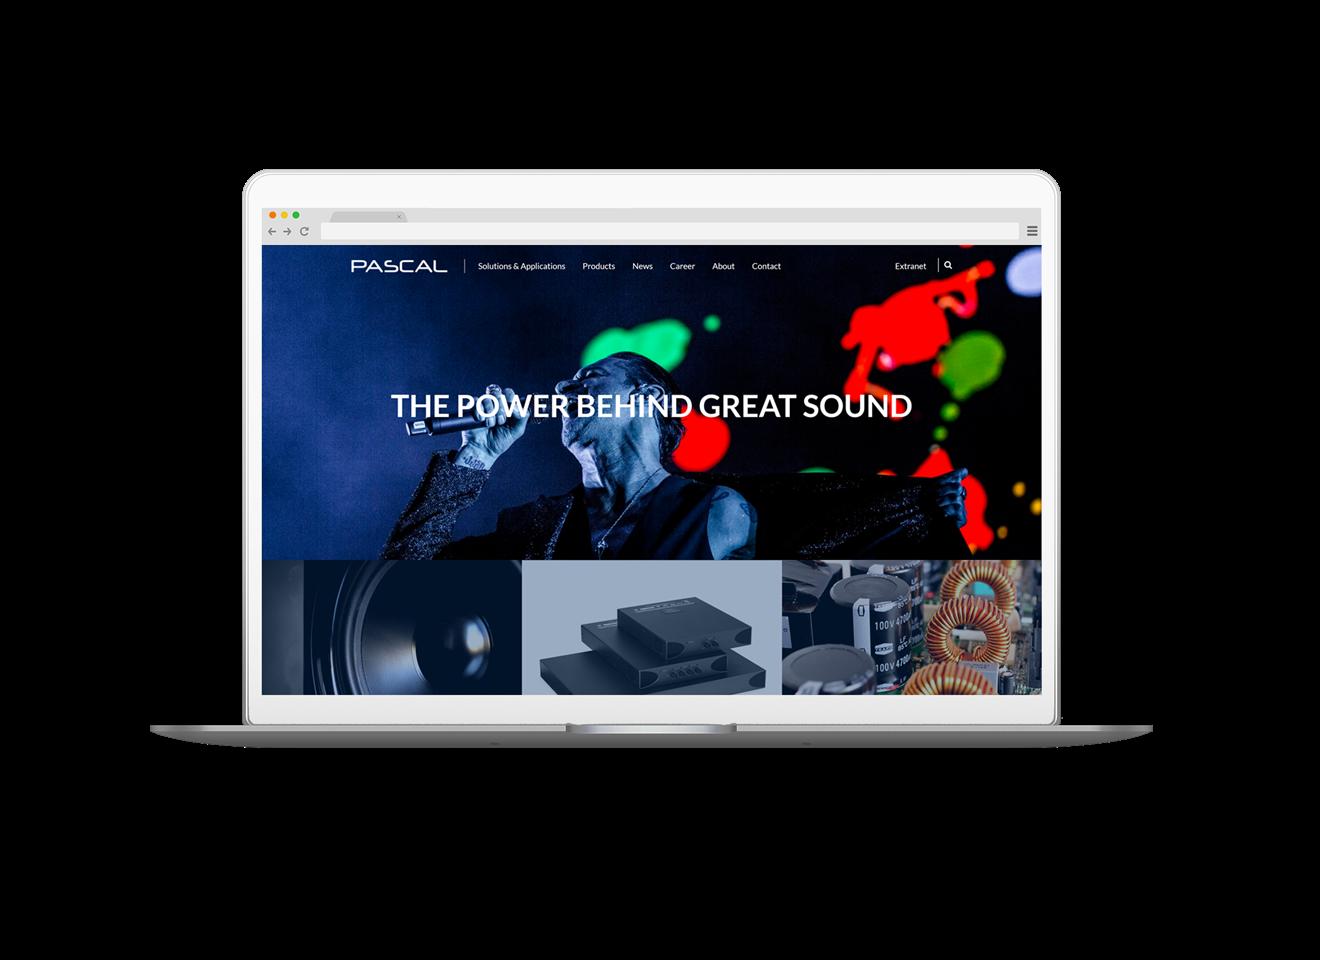 PASCAL webdesign